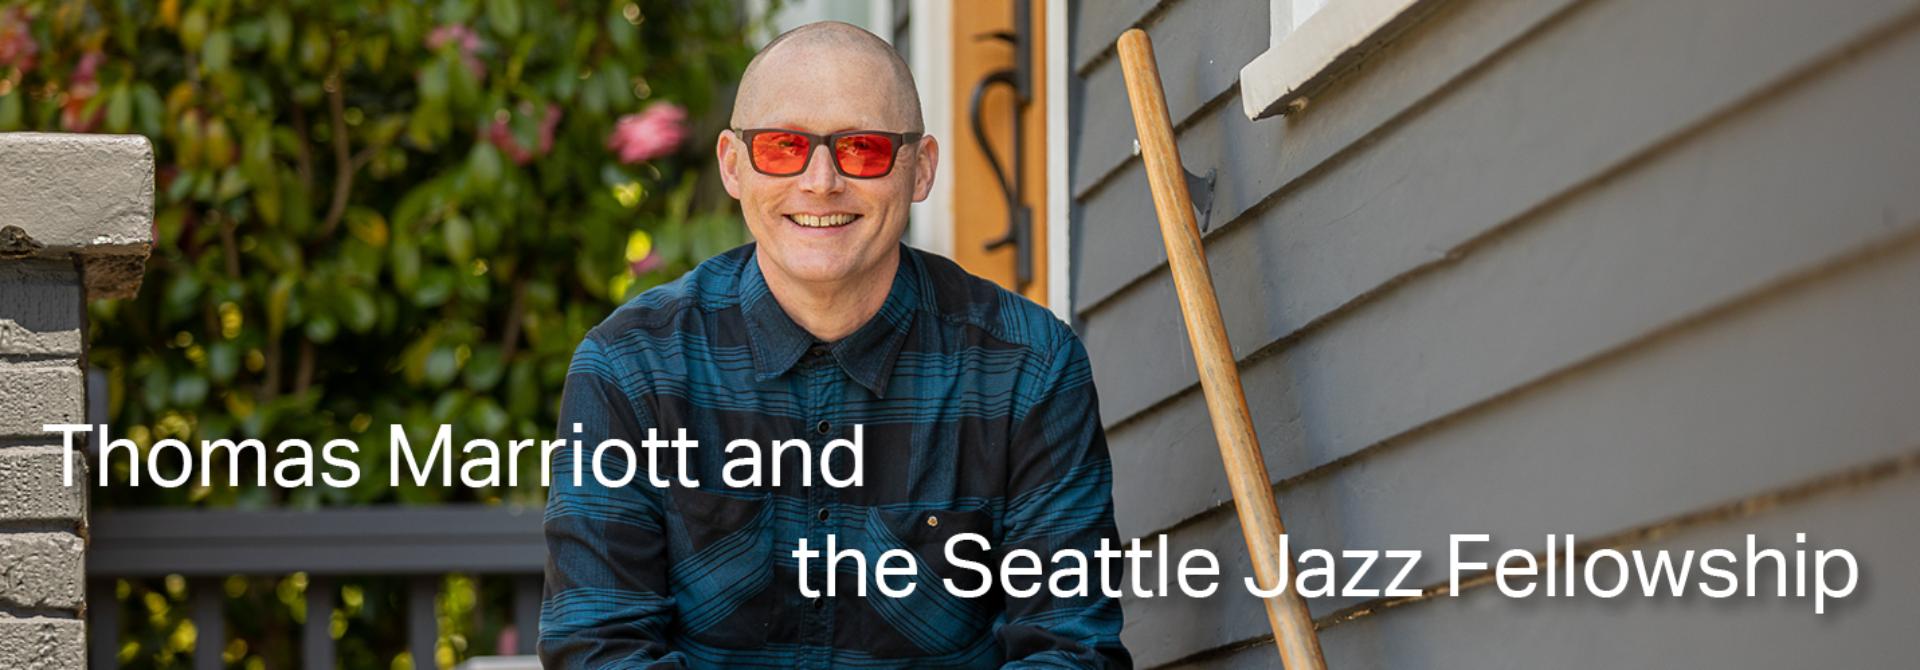 Thomas Marriott Seattle Jazz Fellowship